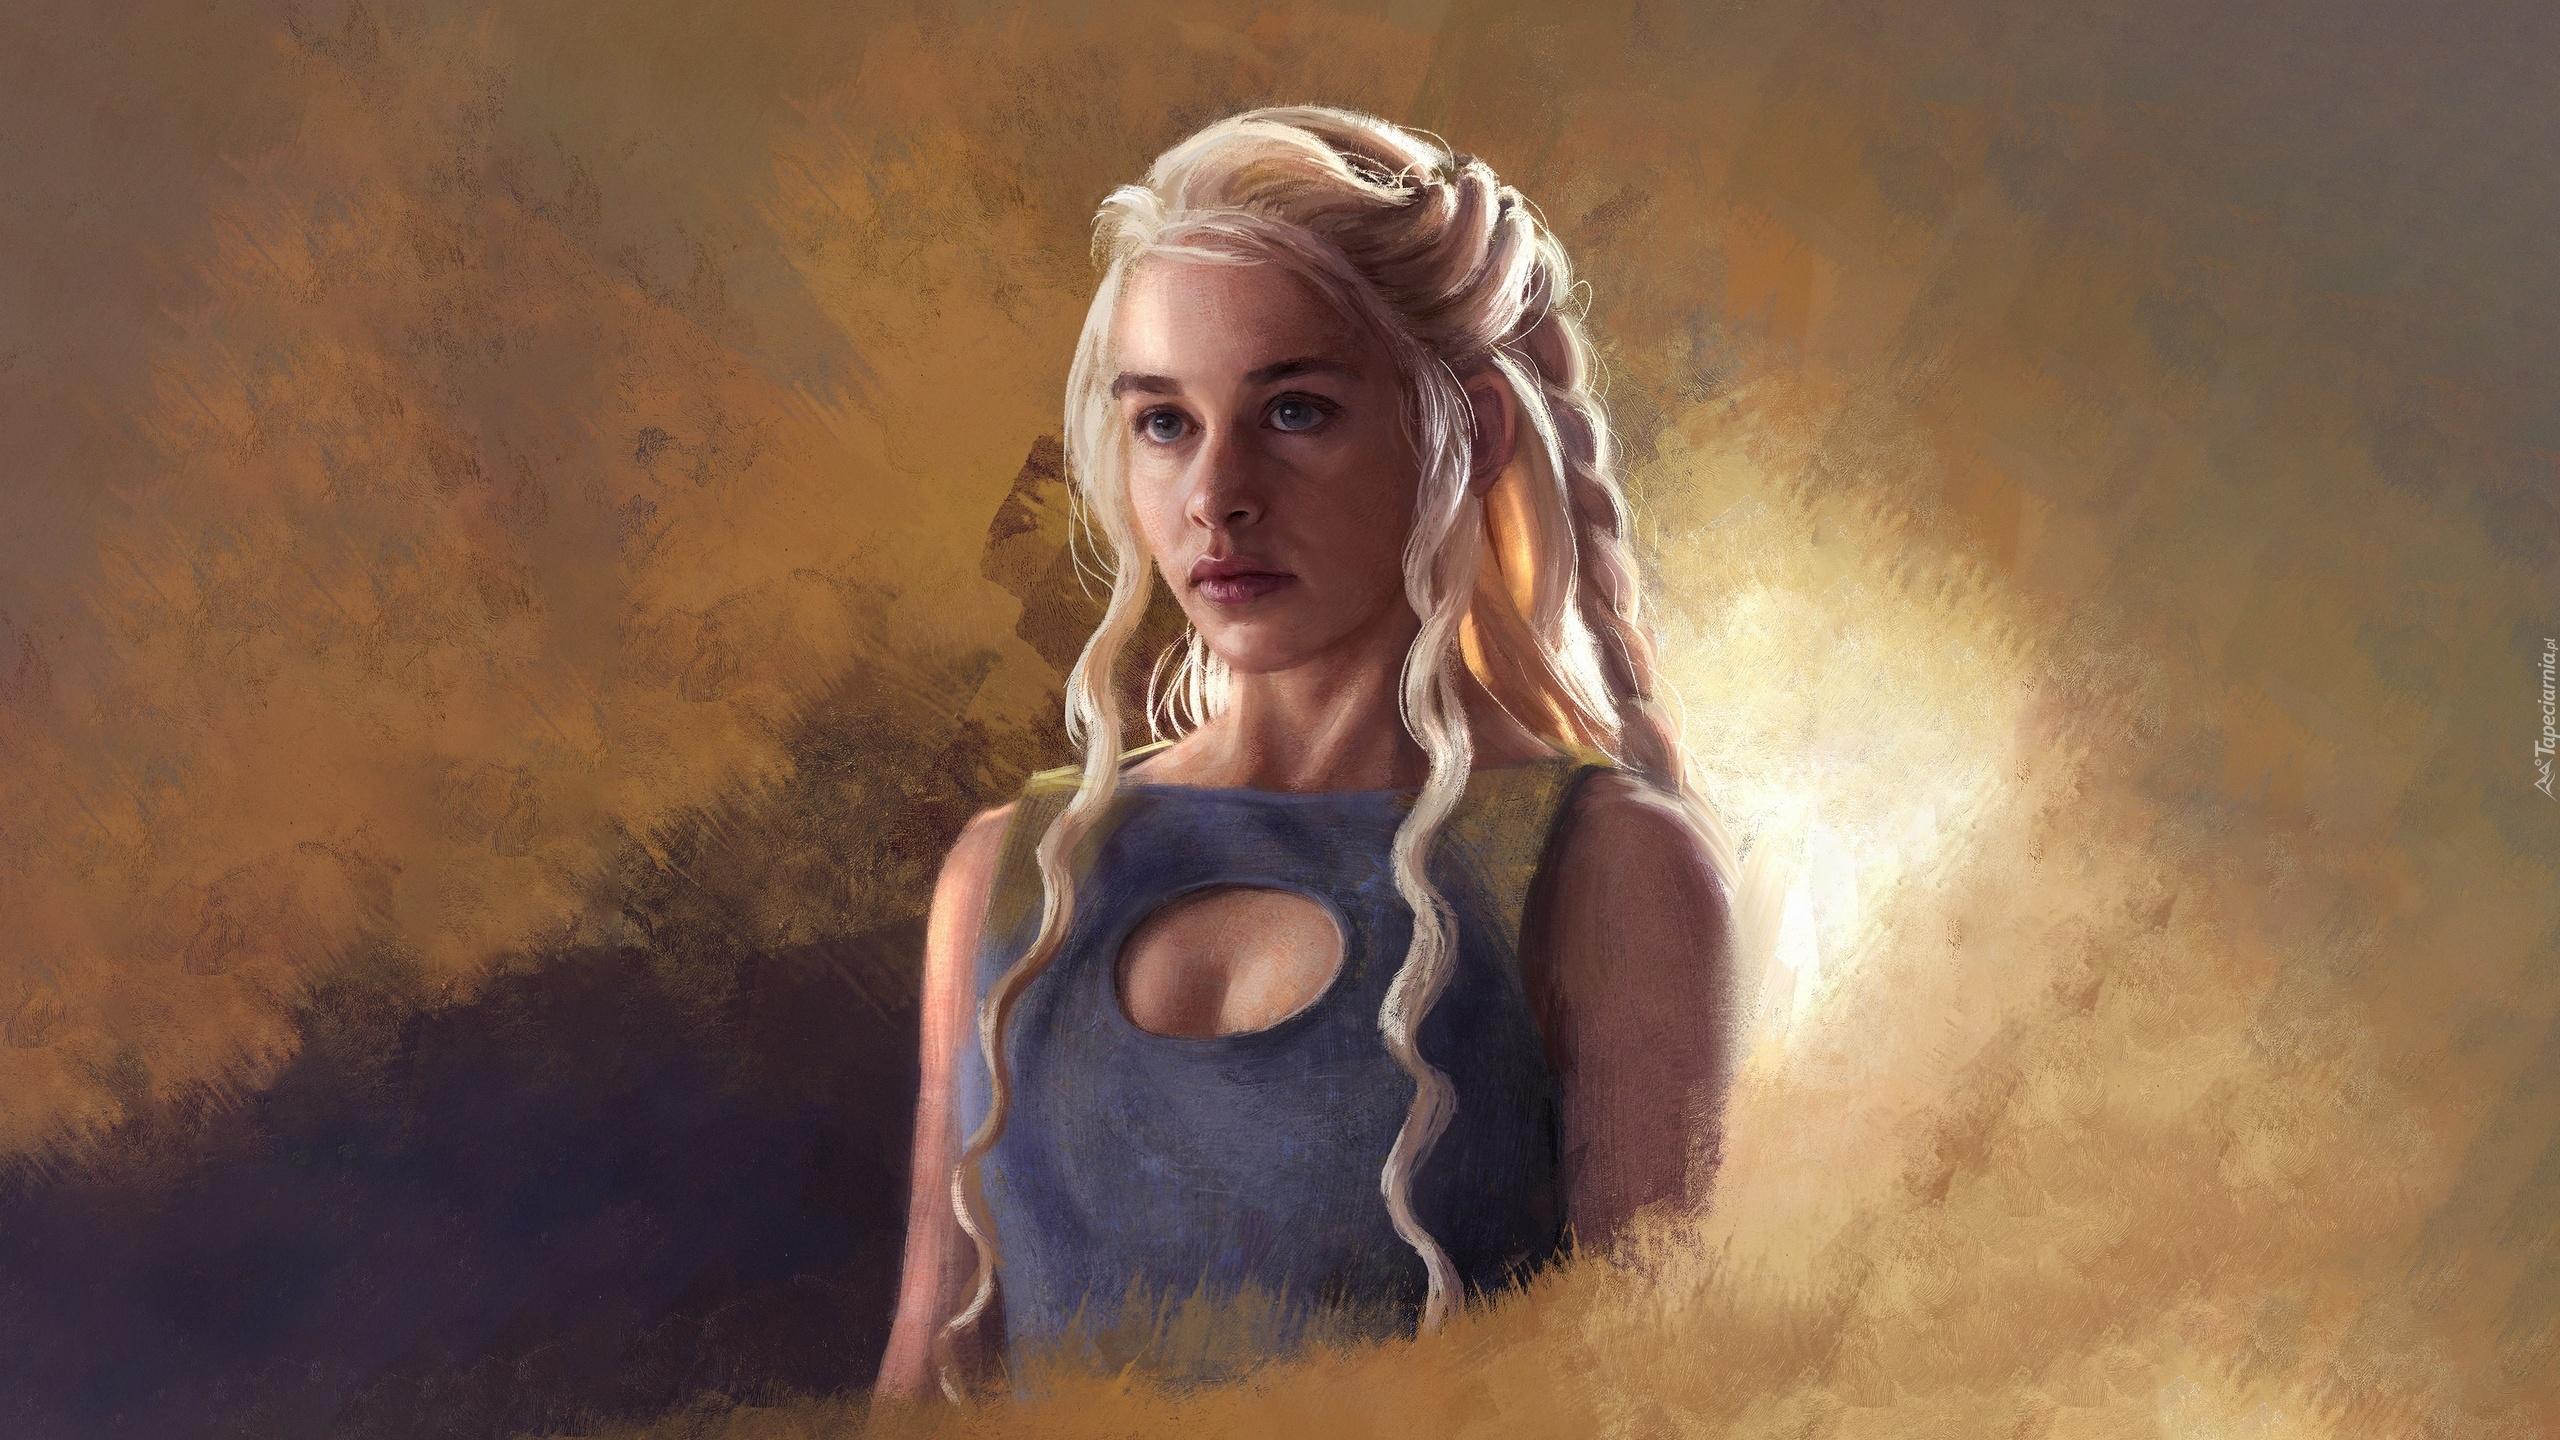 emilia clarke jako daenerys targaryen w serialu gra o tron